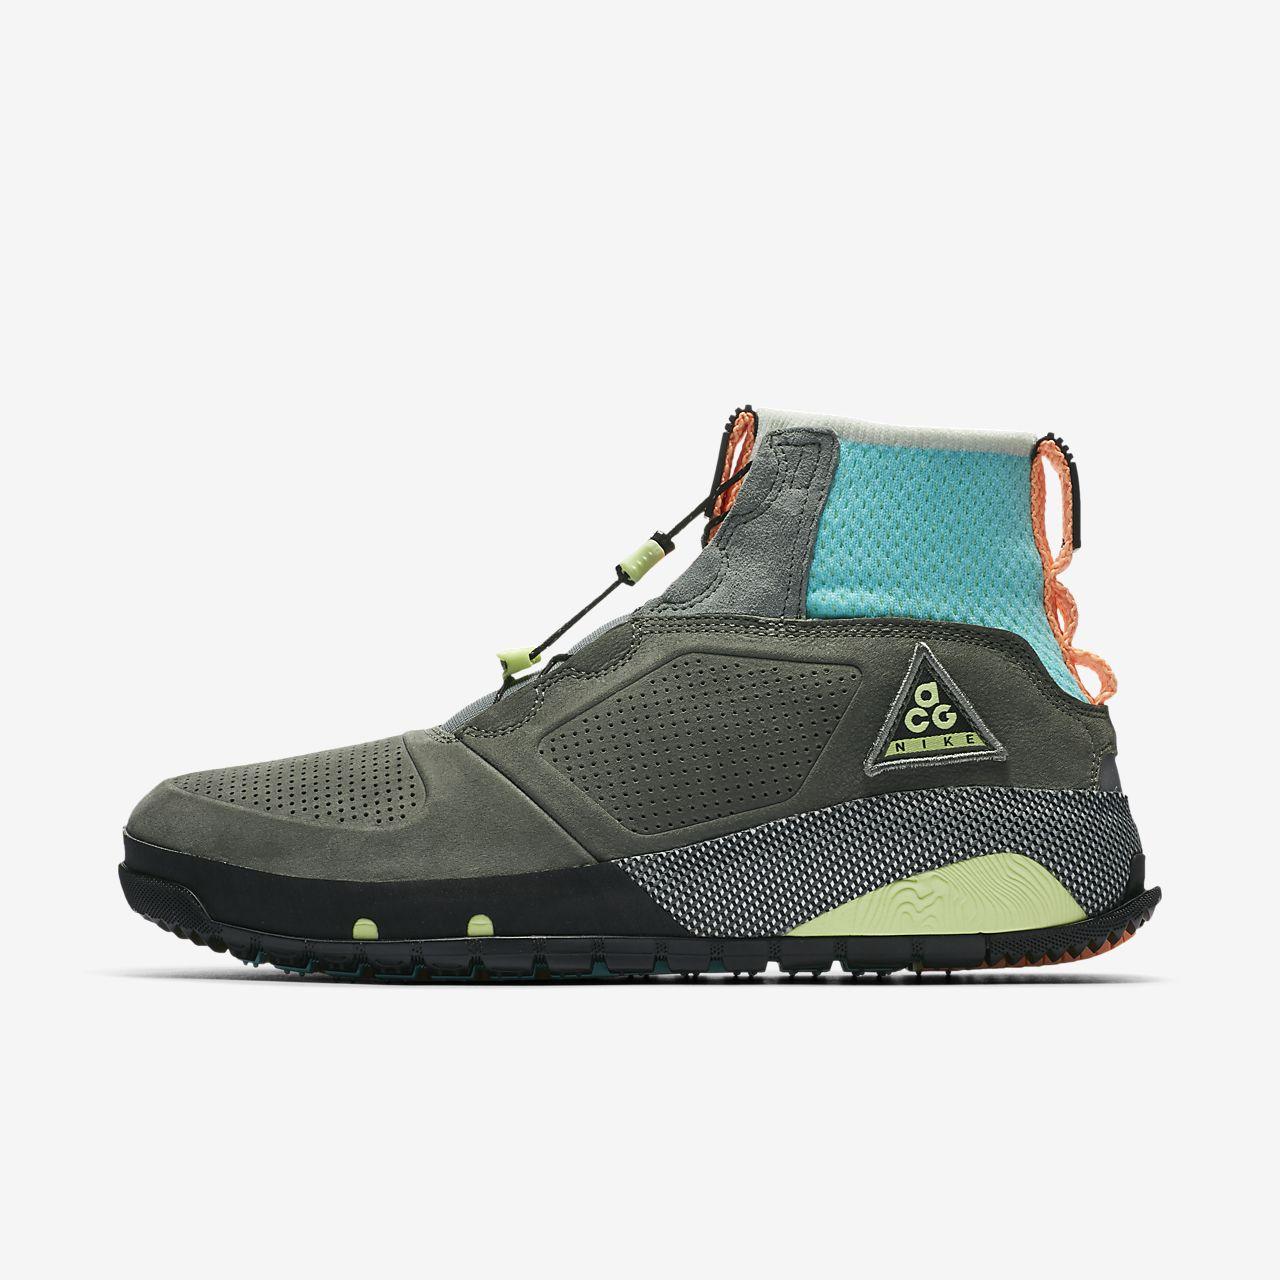 Pánská bota Nike ACG Ruckle Ridge. Nike.com CZ fbadf2abca